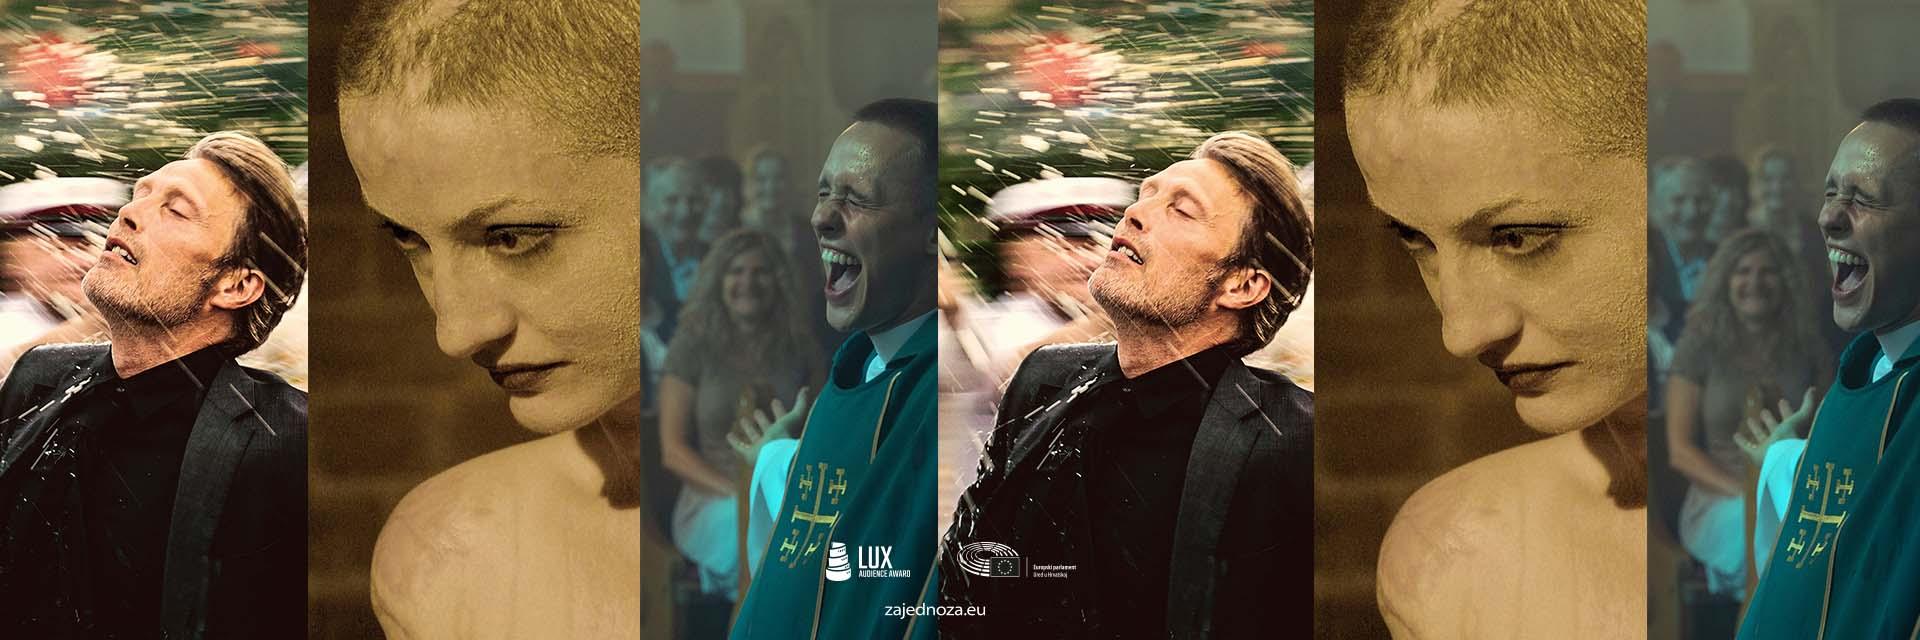 Europski parlament i ZFF donose filmove nominirane za Nagradu publike LUX